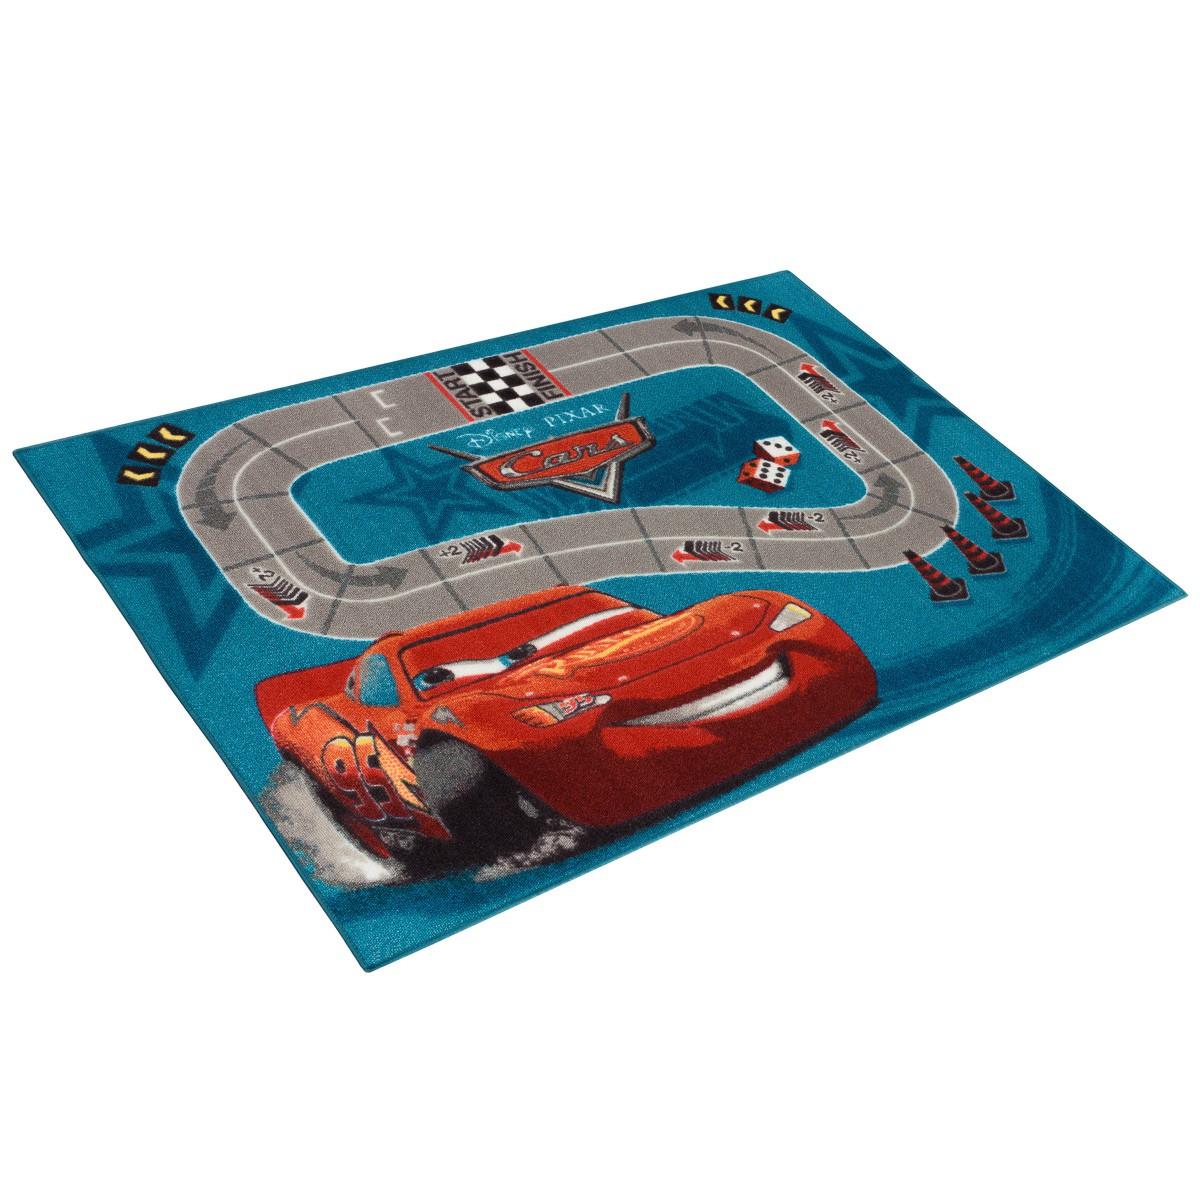 Carpet kids carpet Cars 2 Racetrack play carpet game